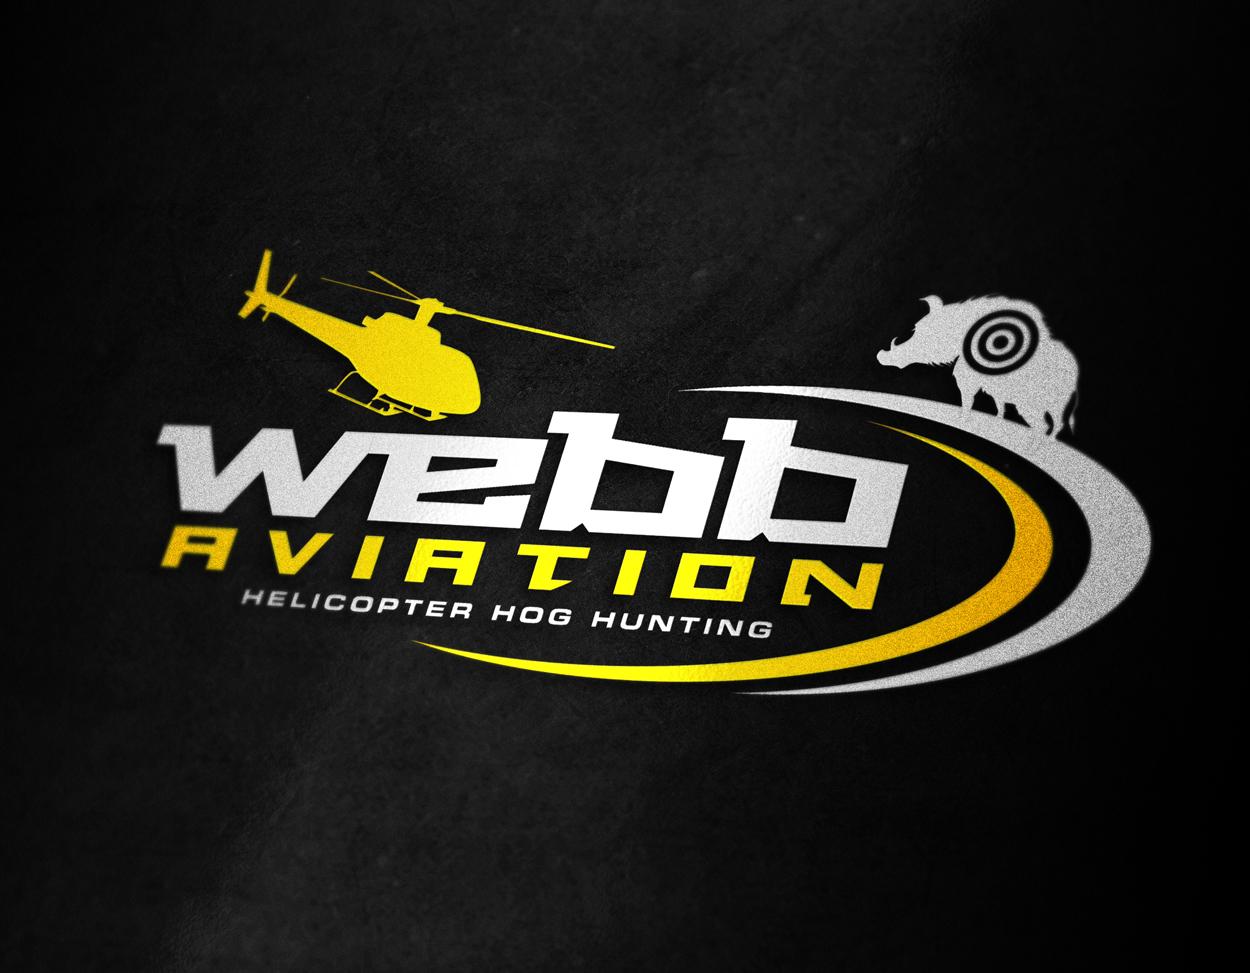 Webb Aviation Helicopter Hunting Logo Design